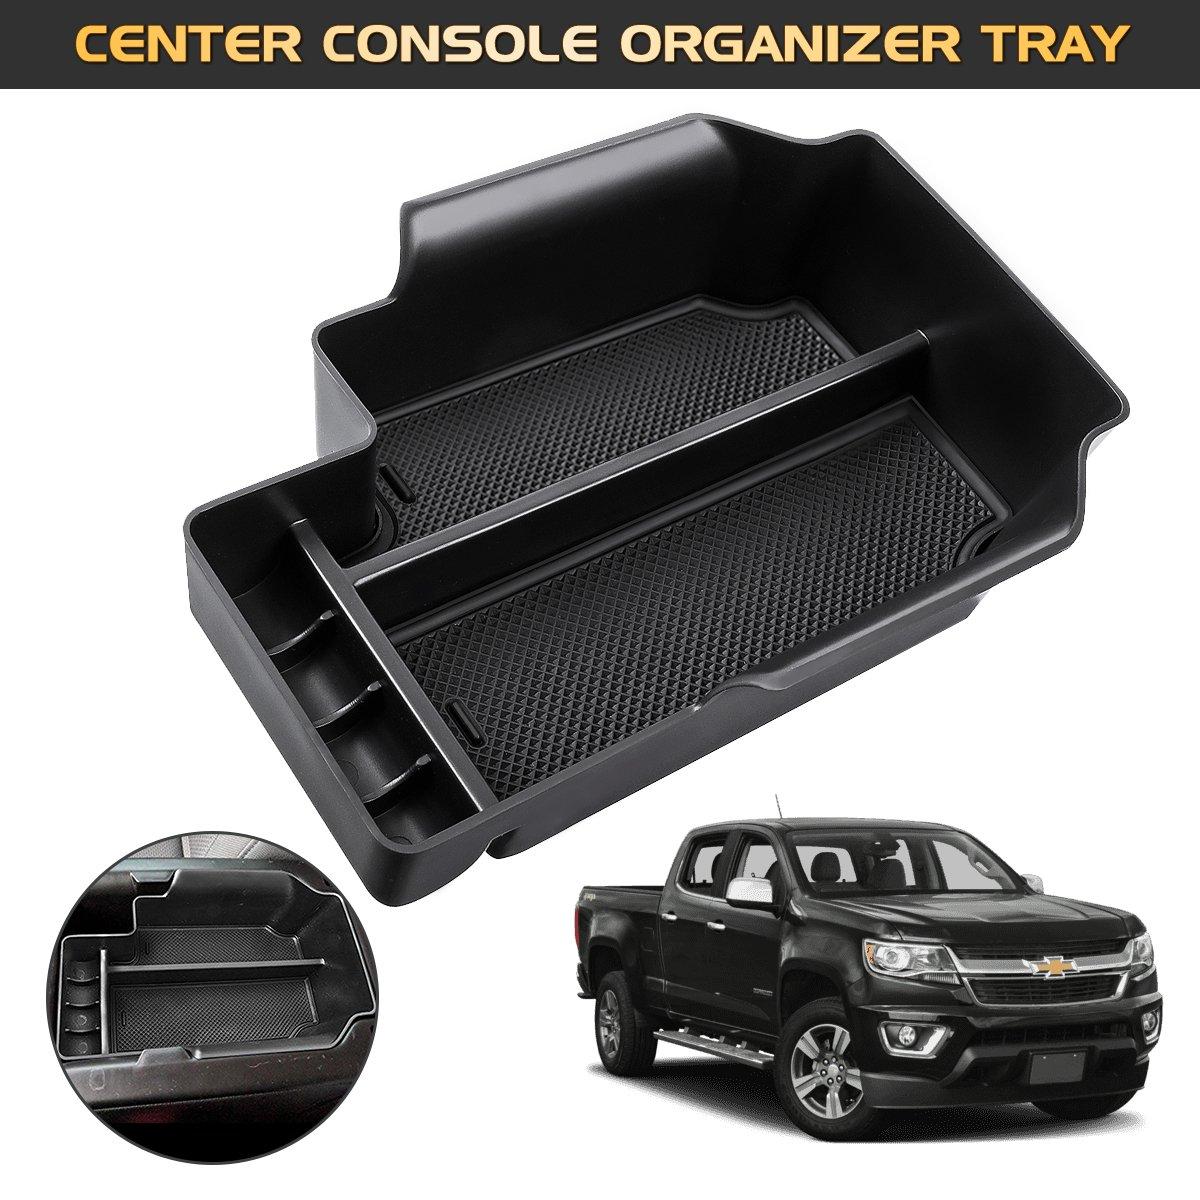 Amazon Com Audew Car Center Console Organizer Tray For Center Chevy